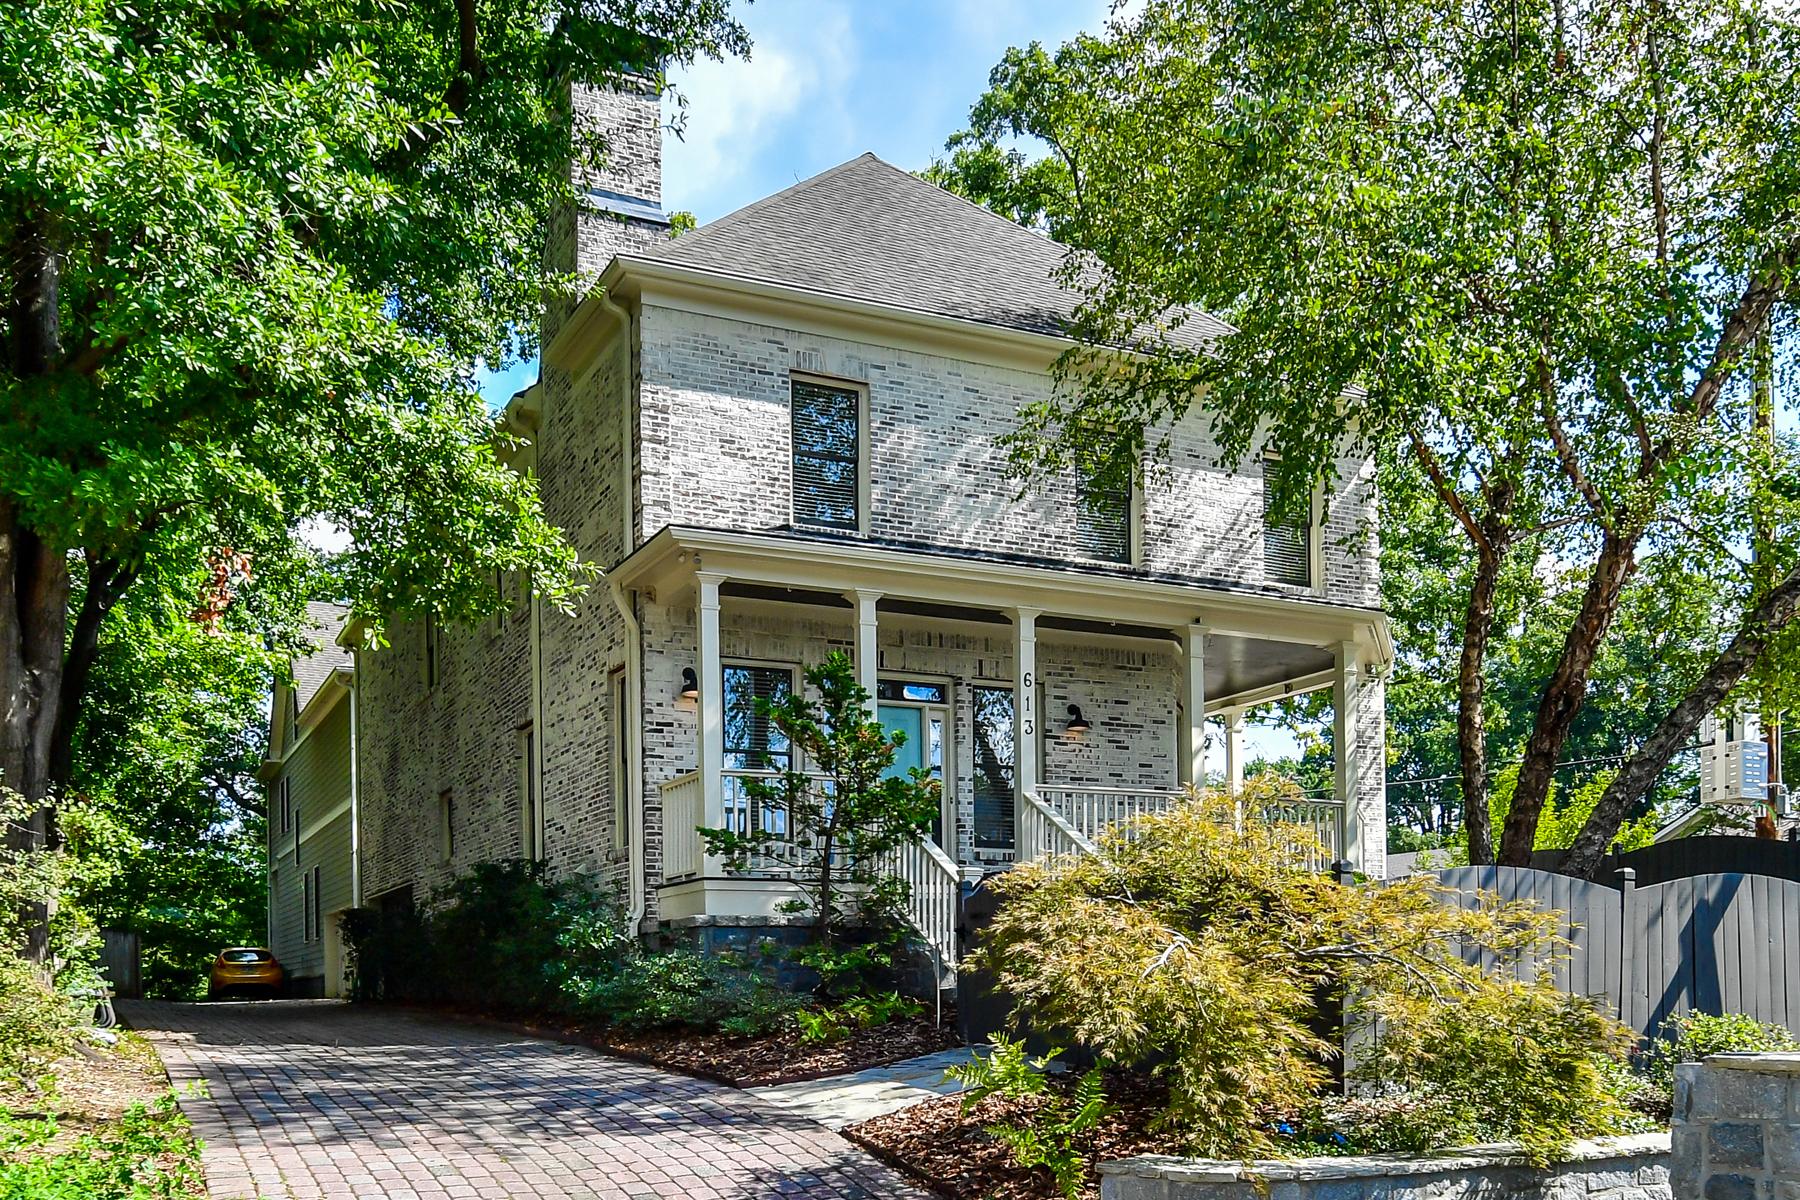 Single Family Home for Sale at Luxury Defined In Poncey Highlands 613 Bonaventure Avenue NE Atlanta, Georgia 30306 United States